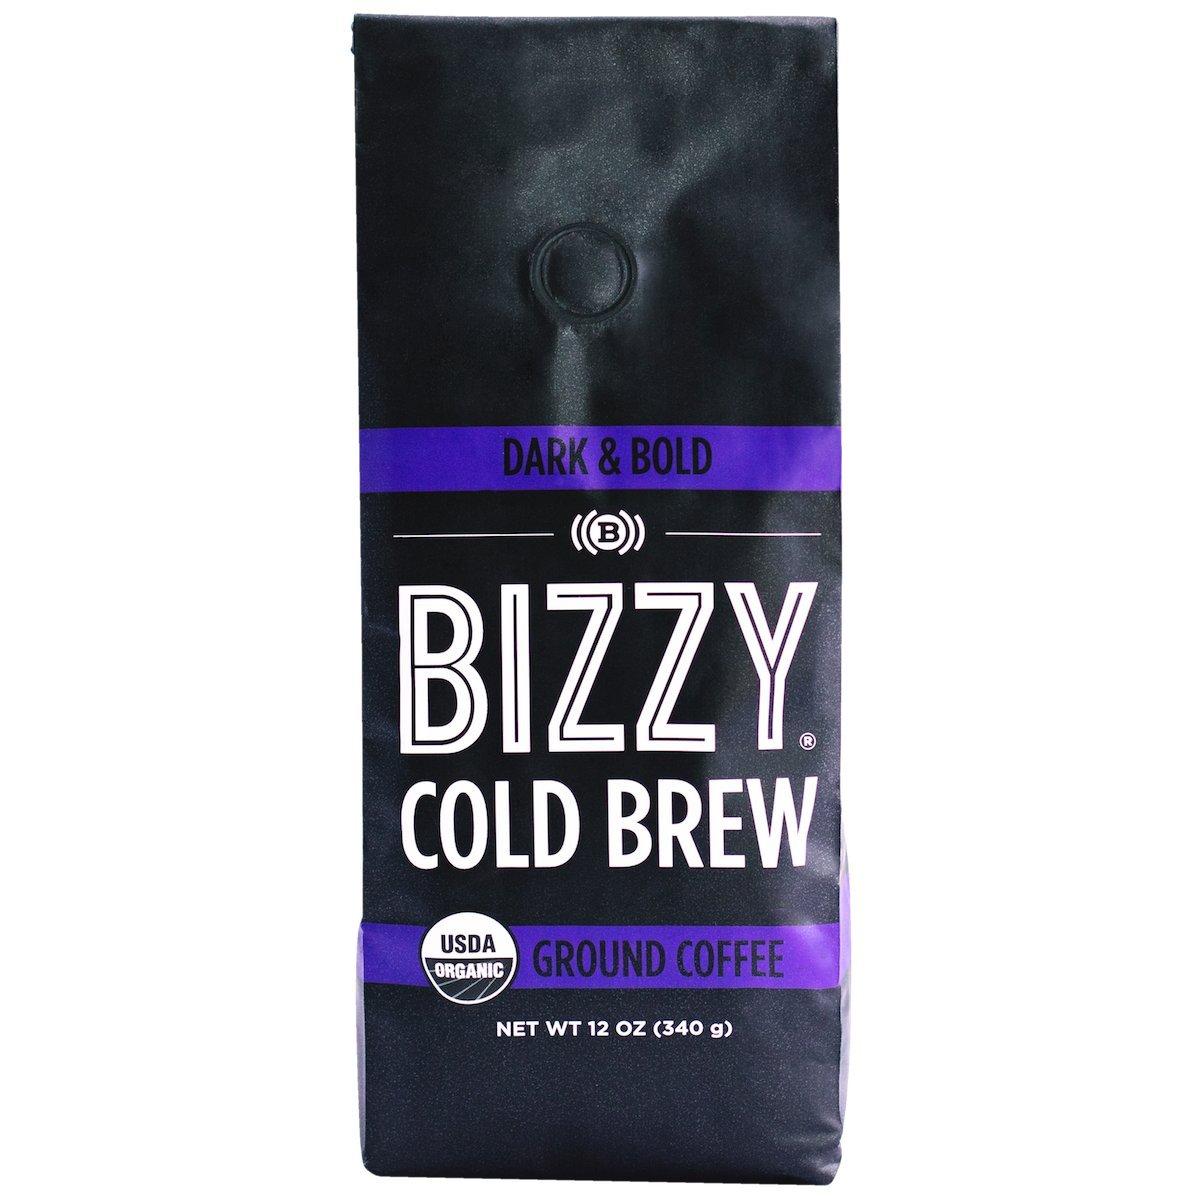 Bizzy Organic Cold Brew Coffee - Dark & Bold Blend - Coarse Ground Coffee - 12 oz